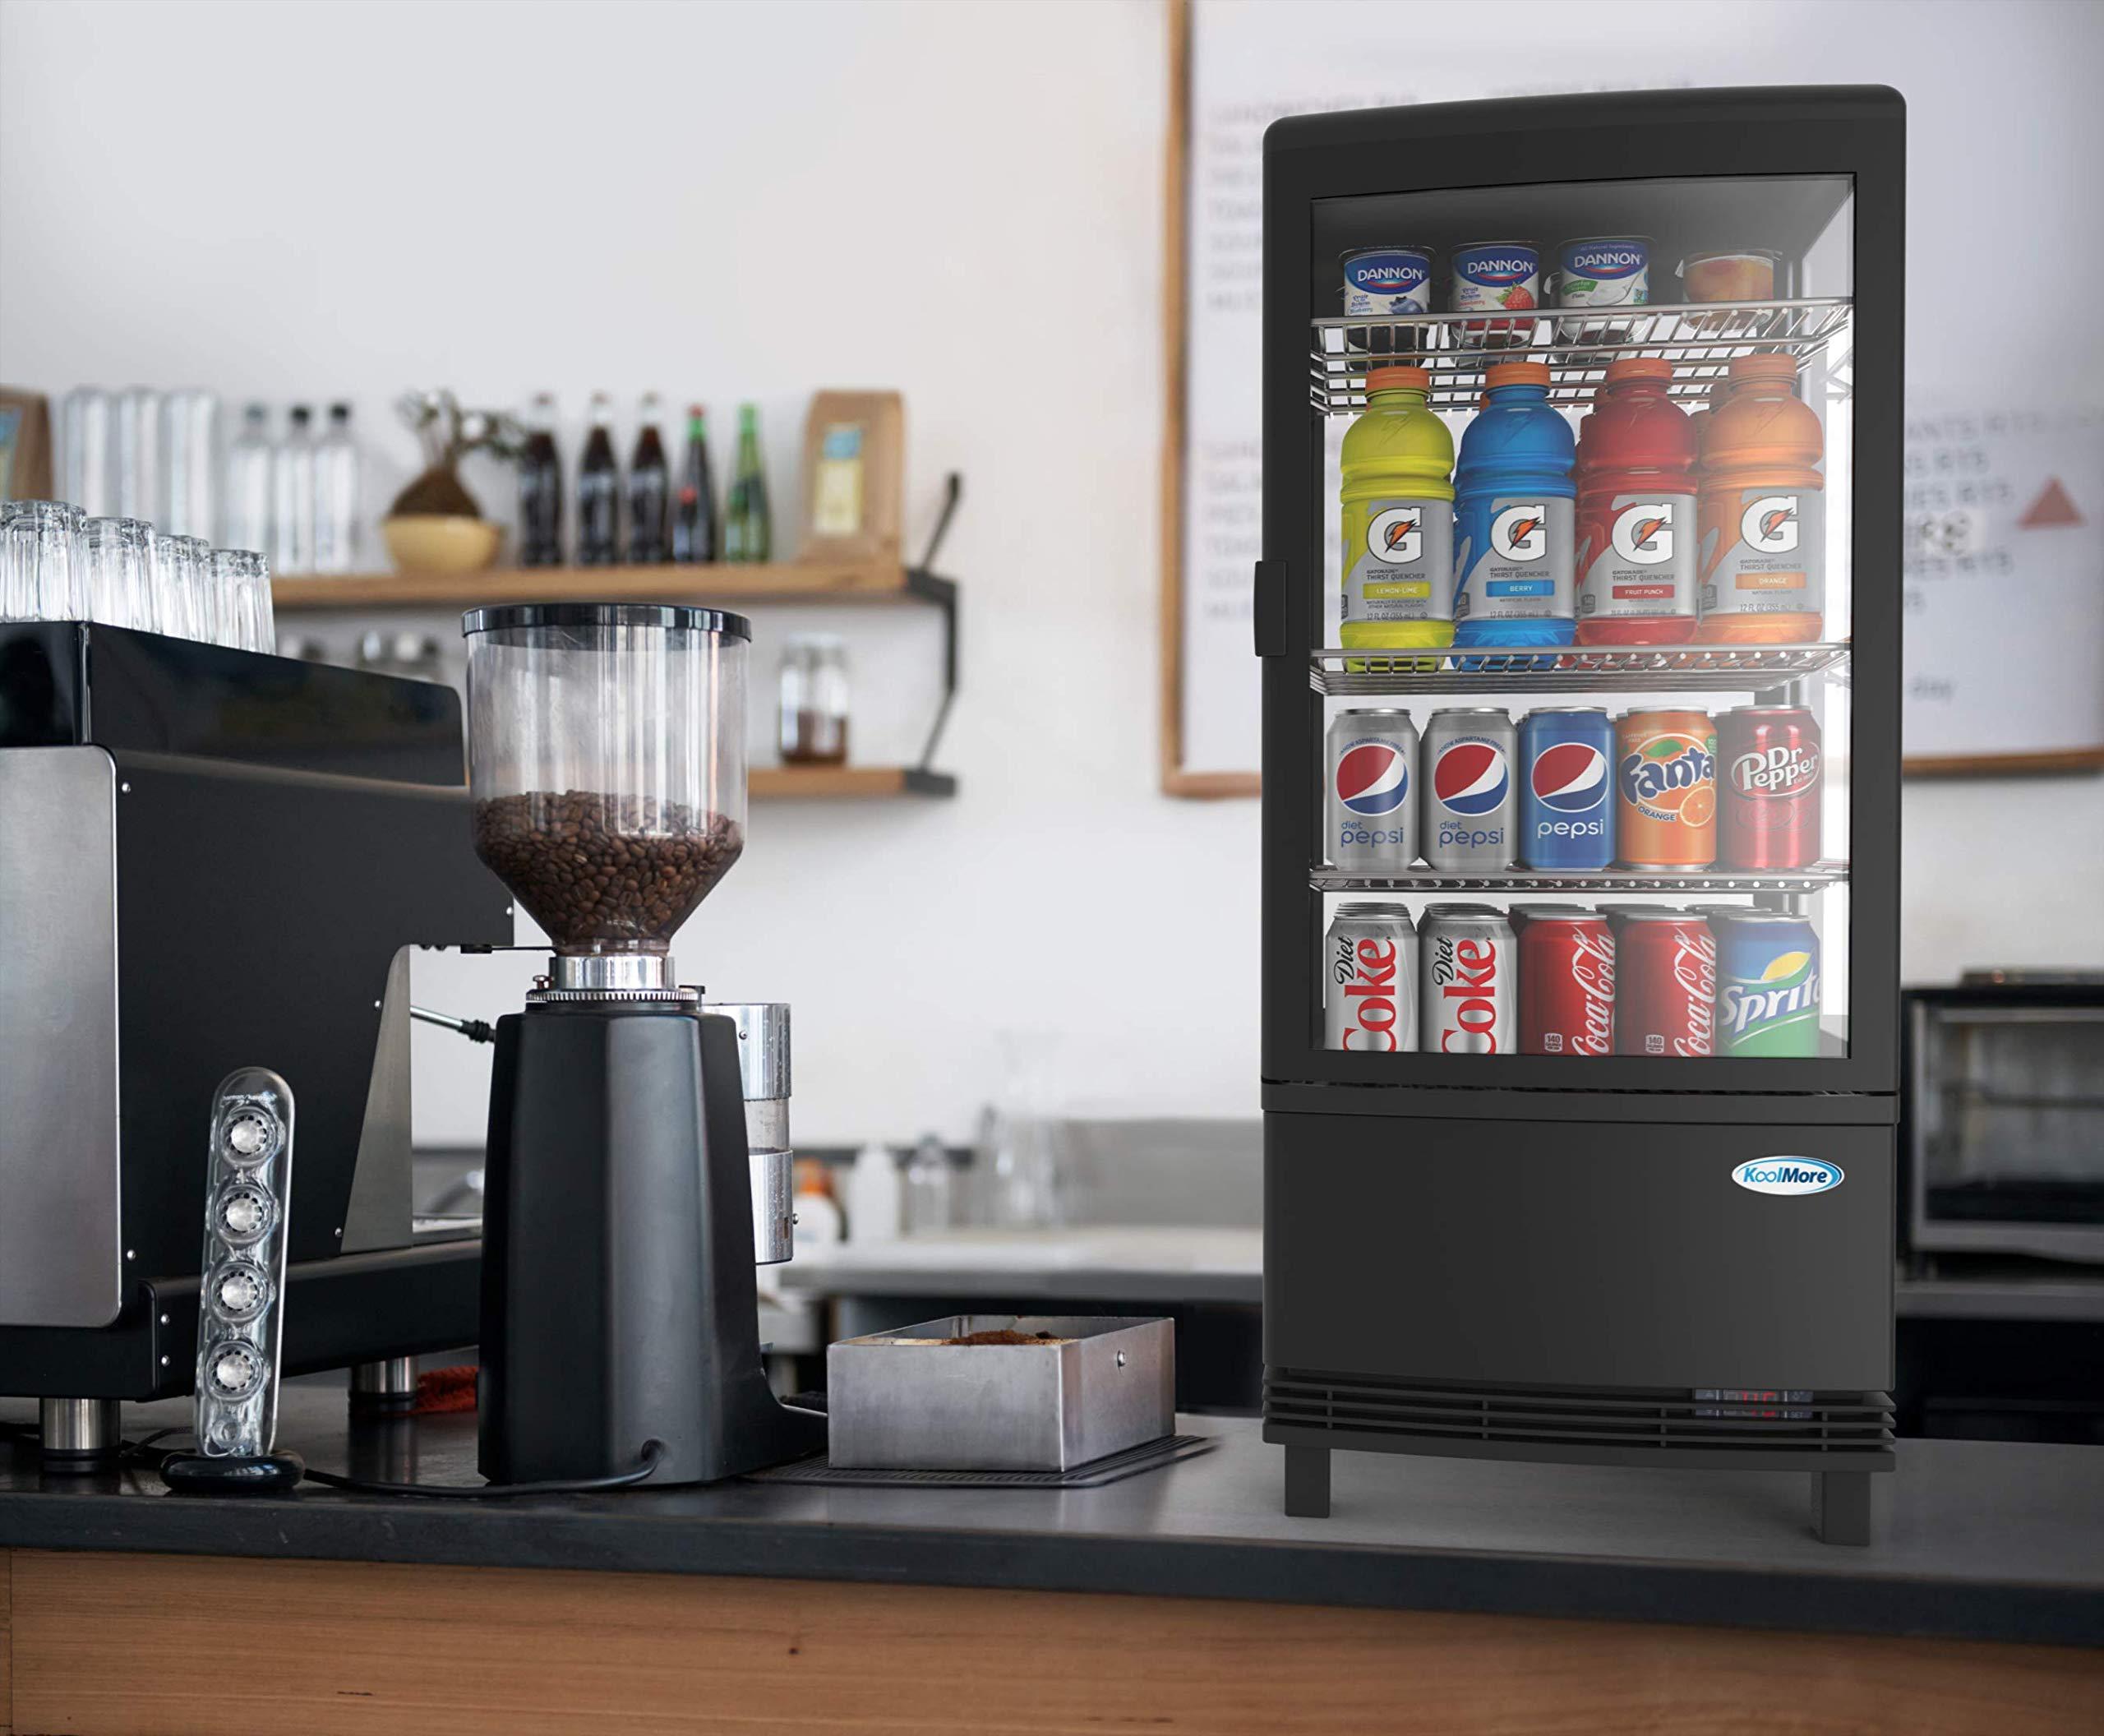 KoolMore Countertop Refrigerator Display Case Commercial Beverage Cooler with LED Lighting – 3 cu. ft Capacity, Black…